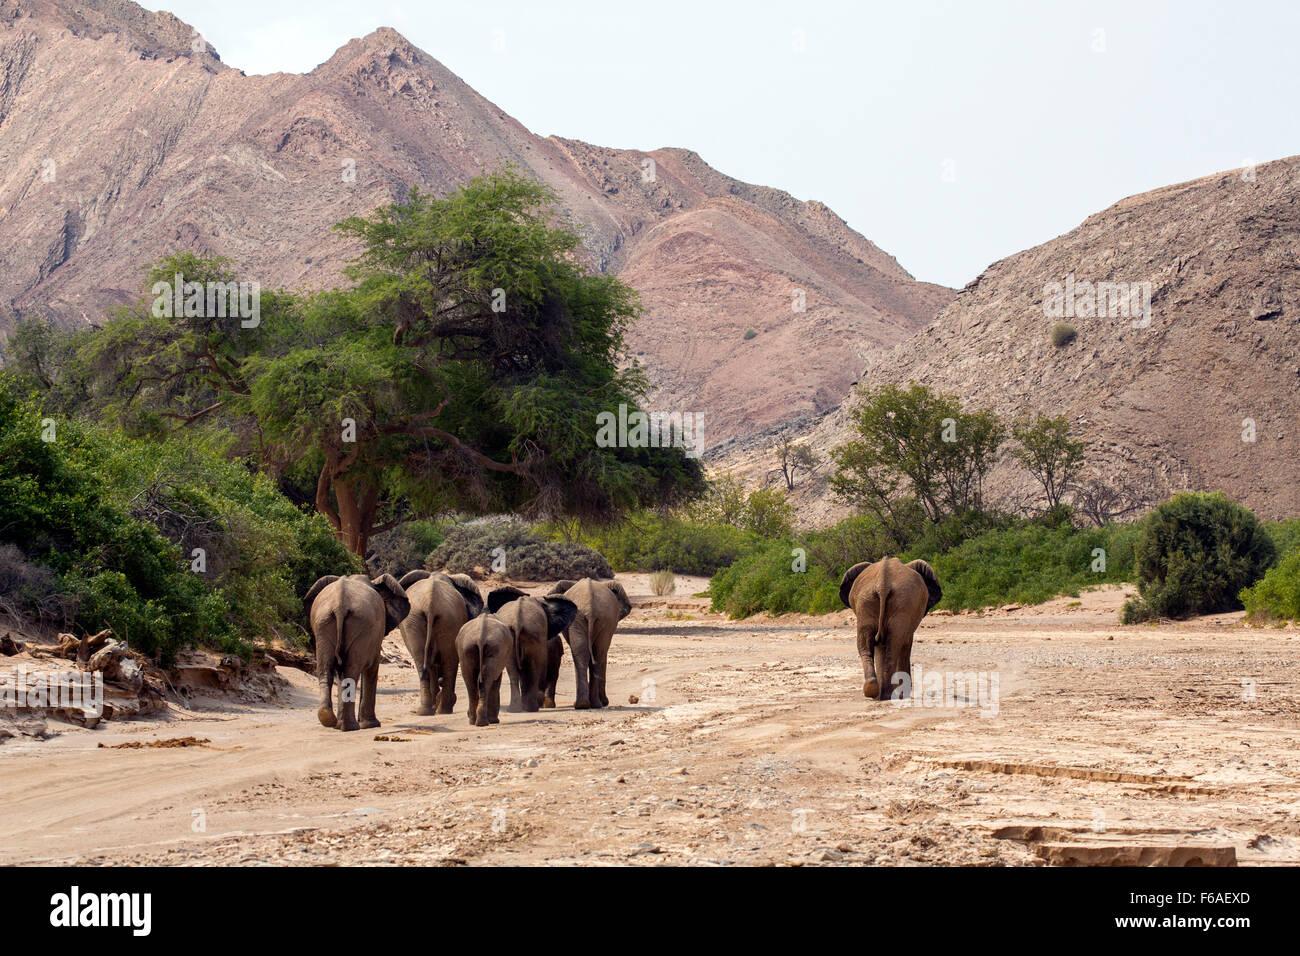 Elephants walking into Kaokoveld, Namibia, Africa - Stock Image